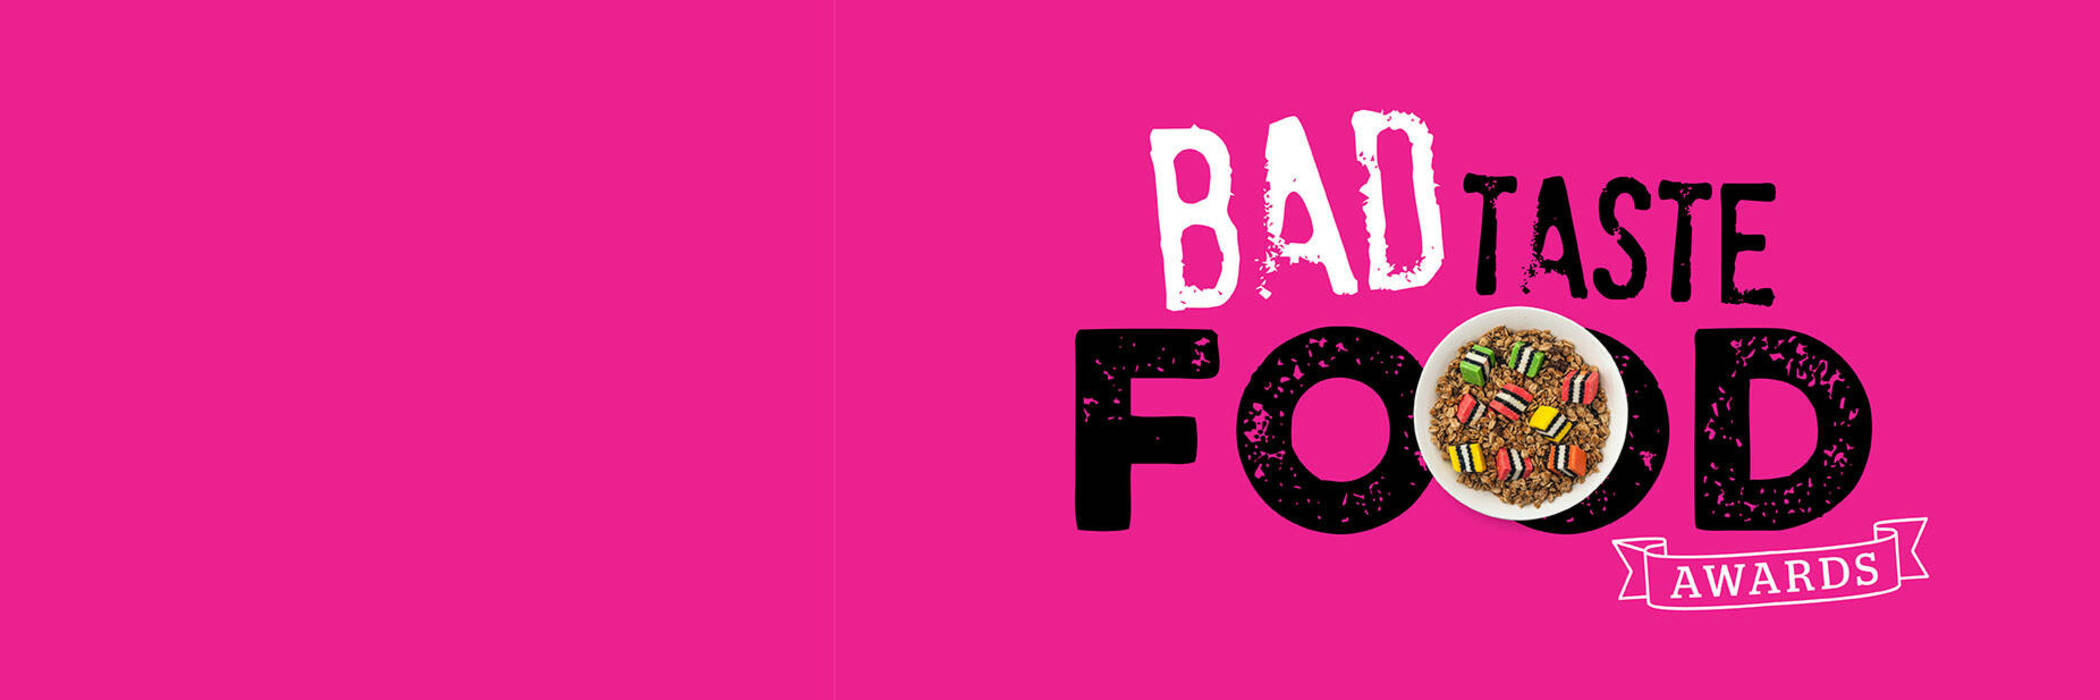 Bad taste food awards pink web